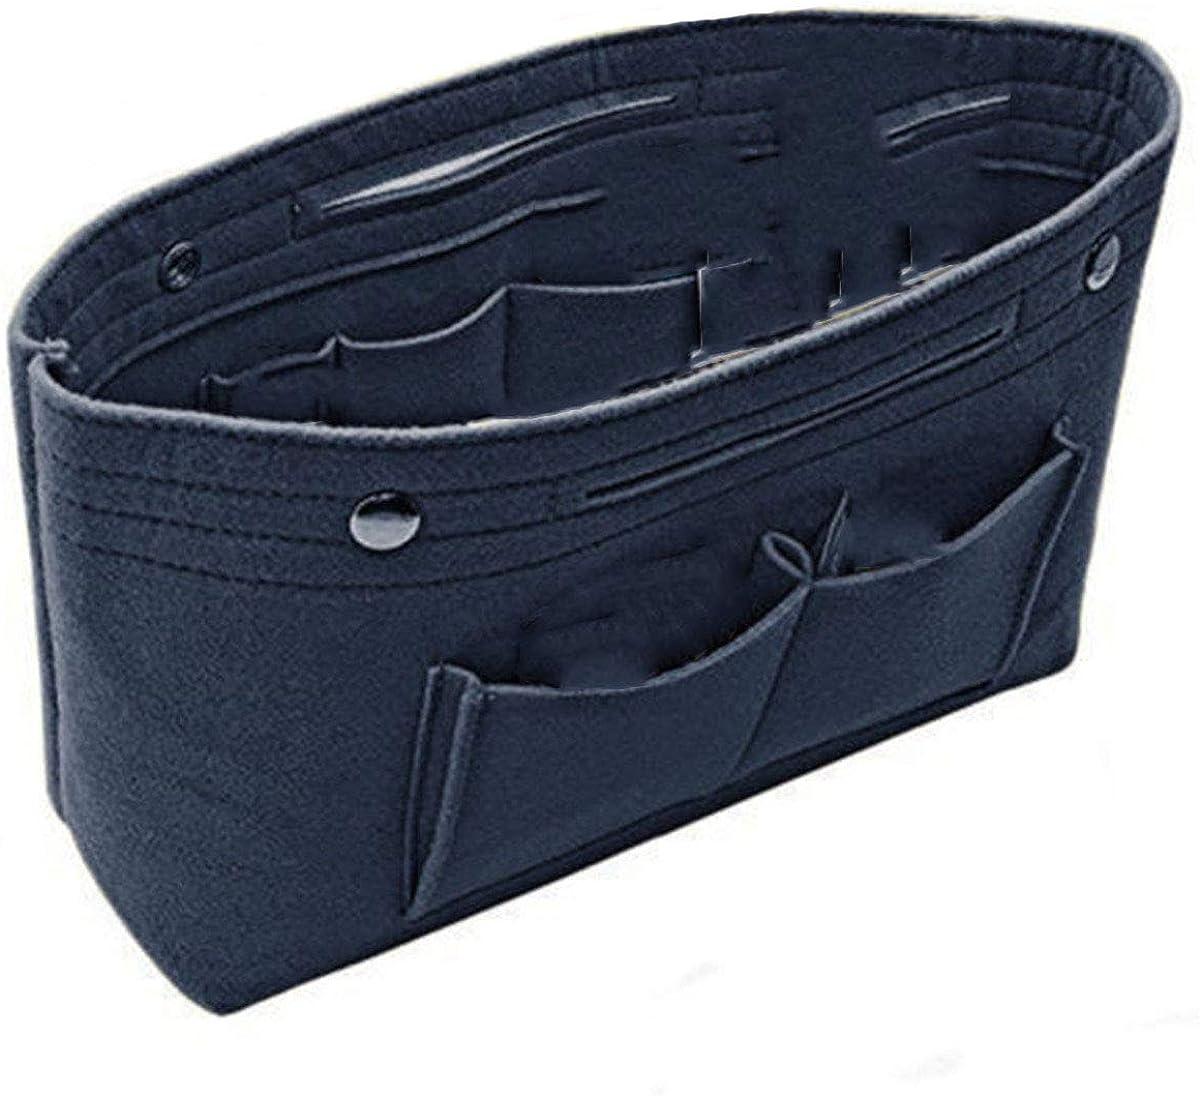 Amazon.com: Women Handbag Organizer Bag Multi Pockets Felt Travel Bag  Insert Liner Purse Organiser Travel Cosmetic Bag (Blue): Shoes